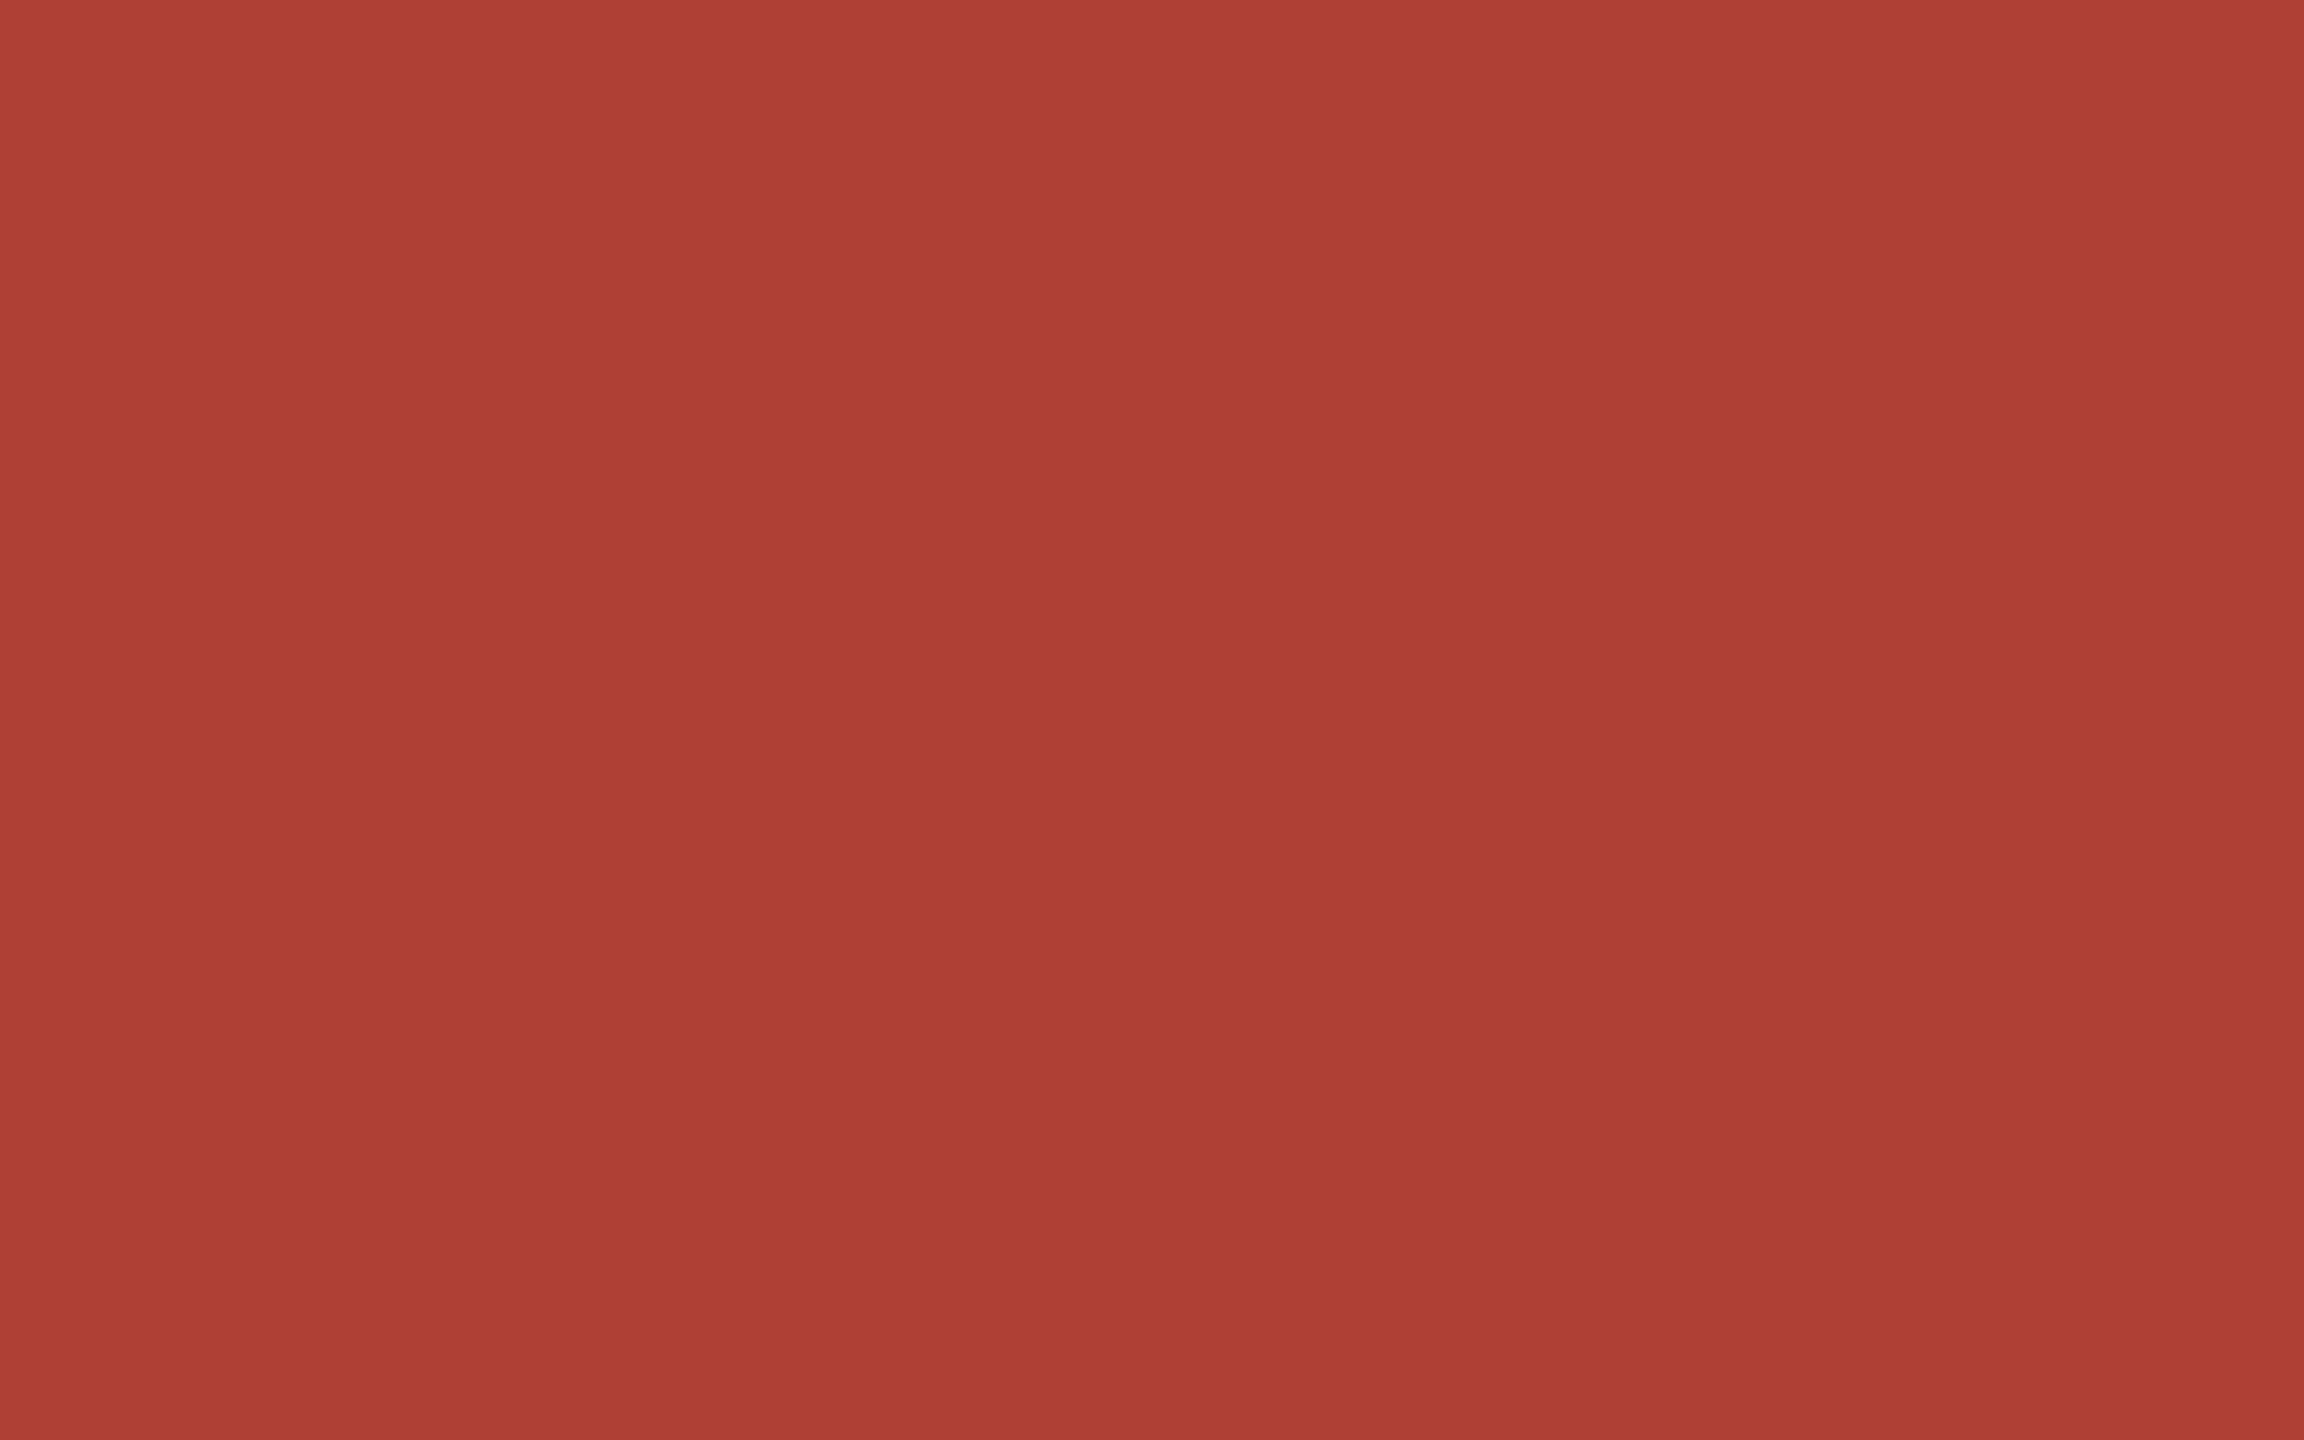 2304x1440 Pale Carmine Solid Color Background